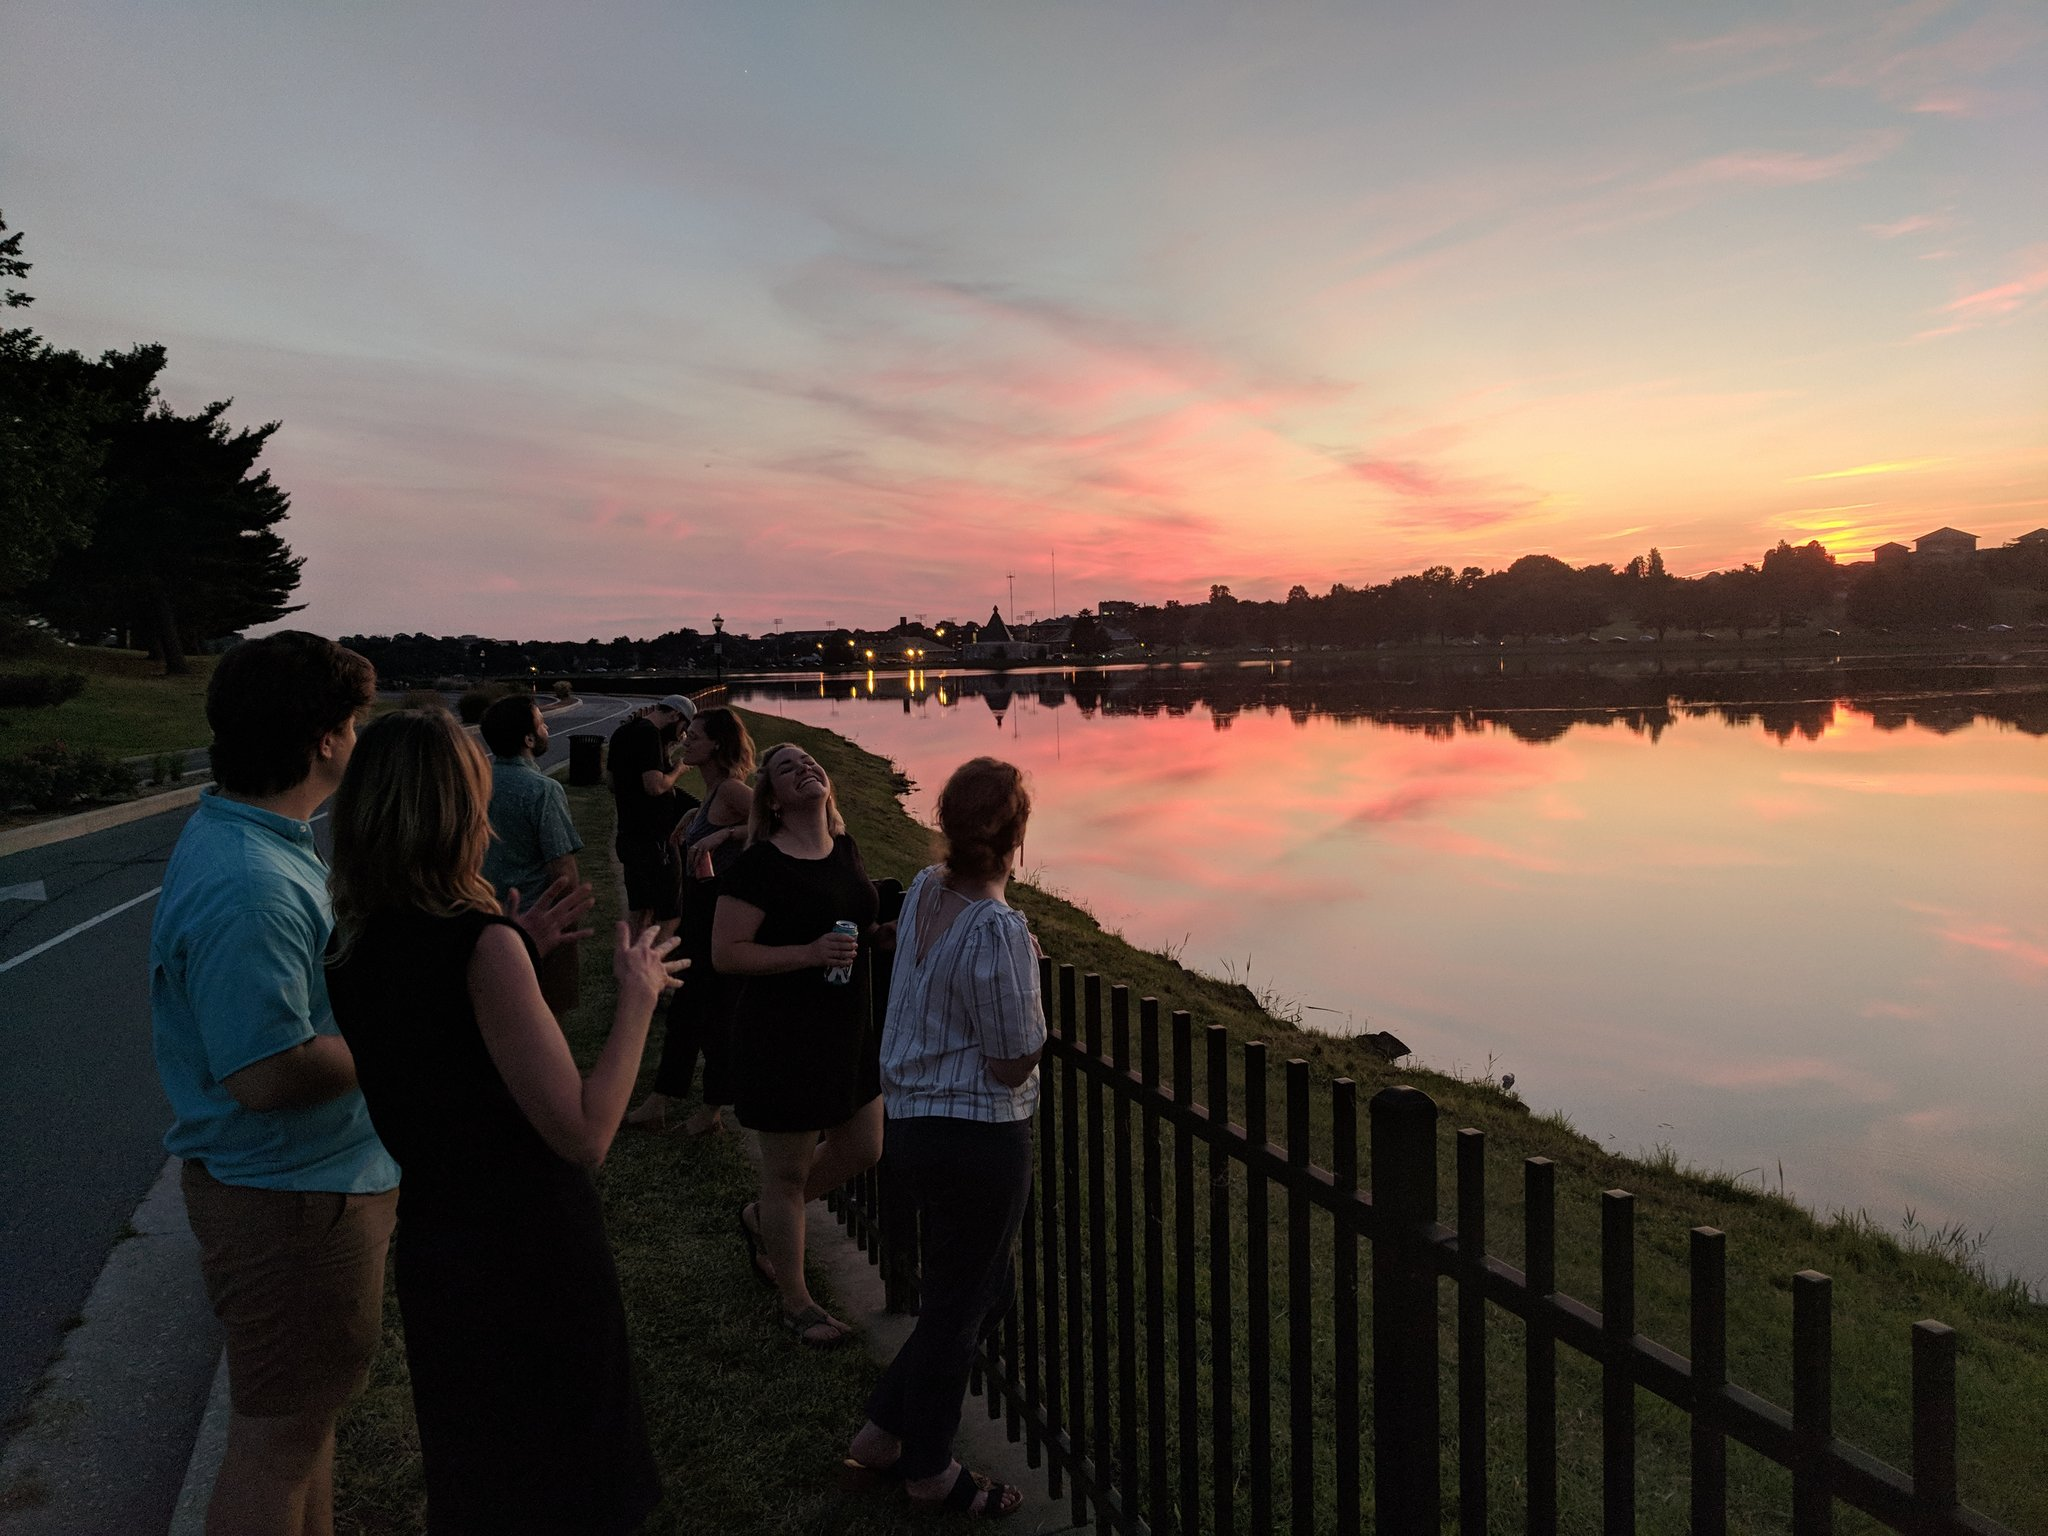 Sunset at Lake Montebello